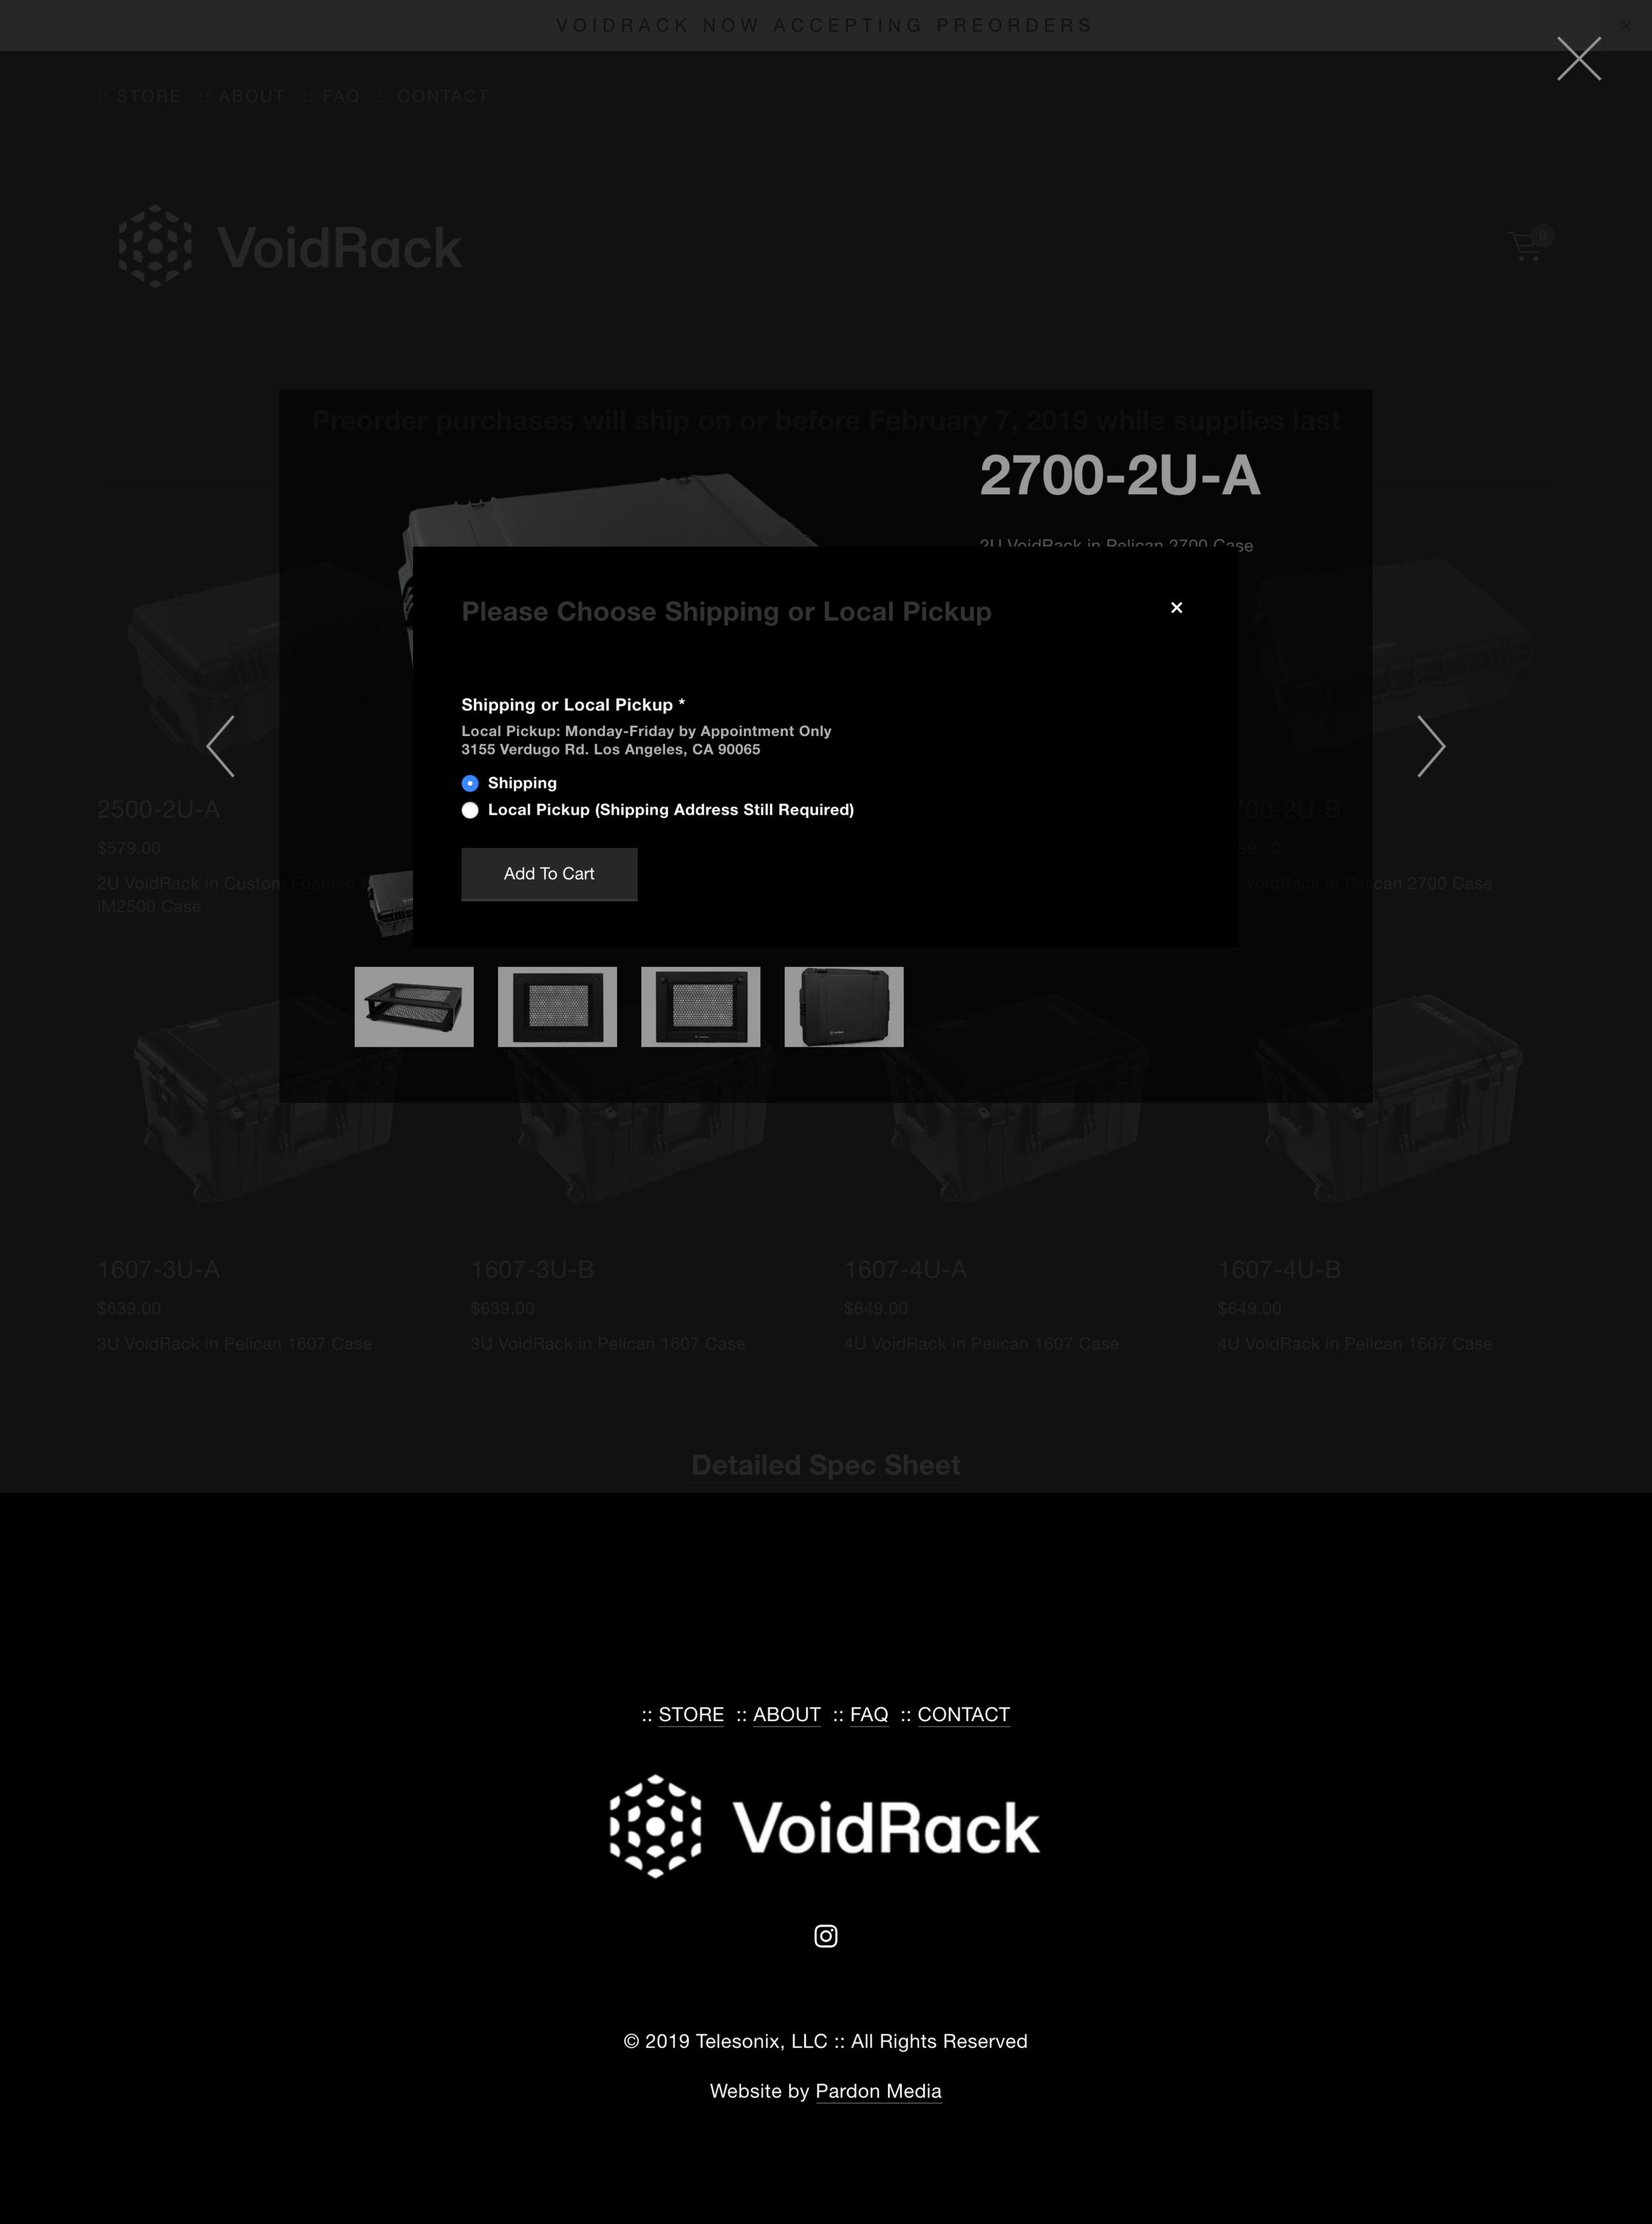 screencapture-voidrack-store-2018-12-23-21_14_05.png